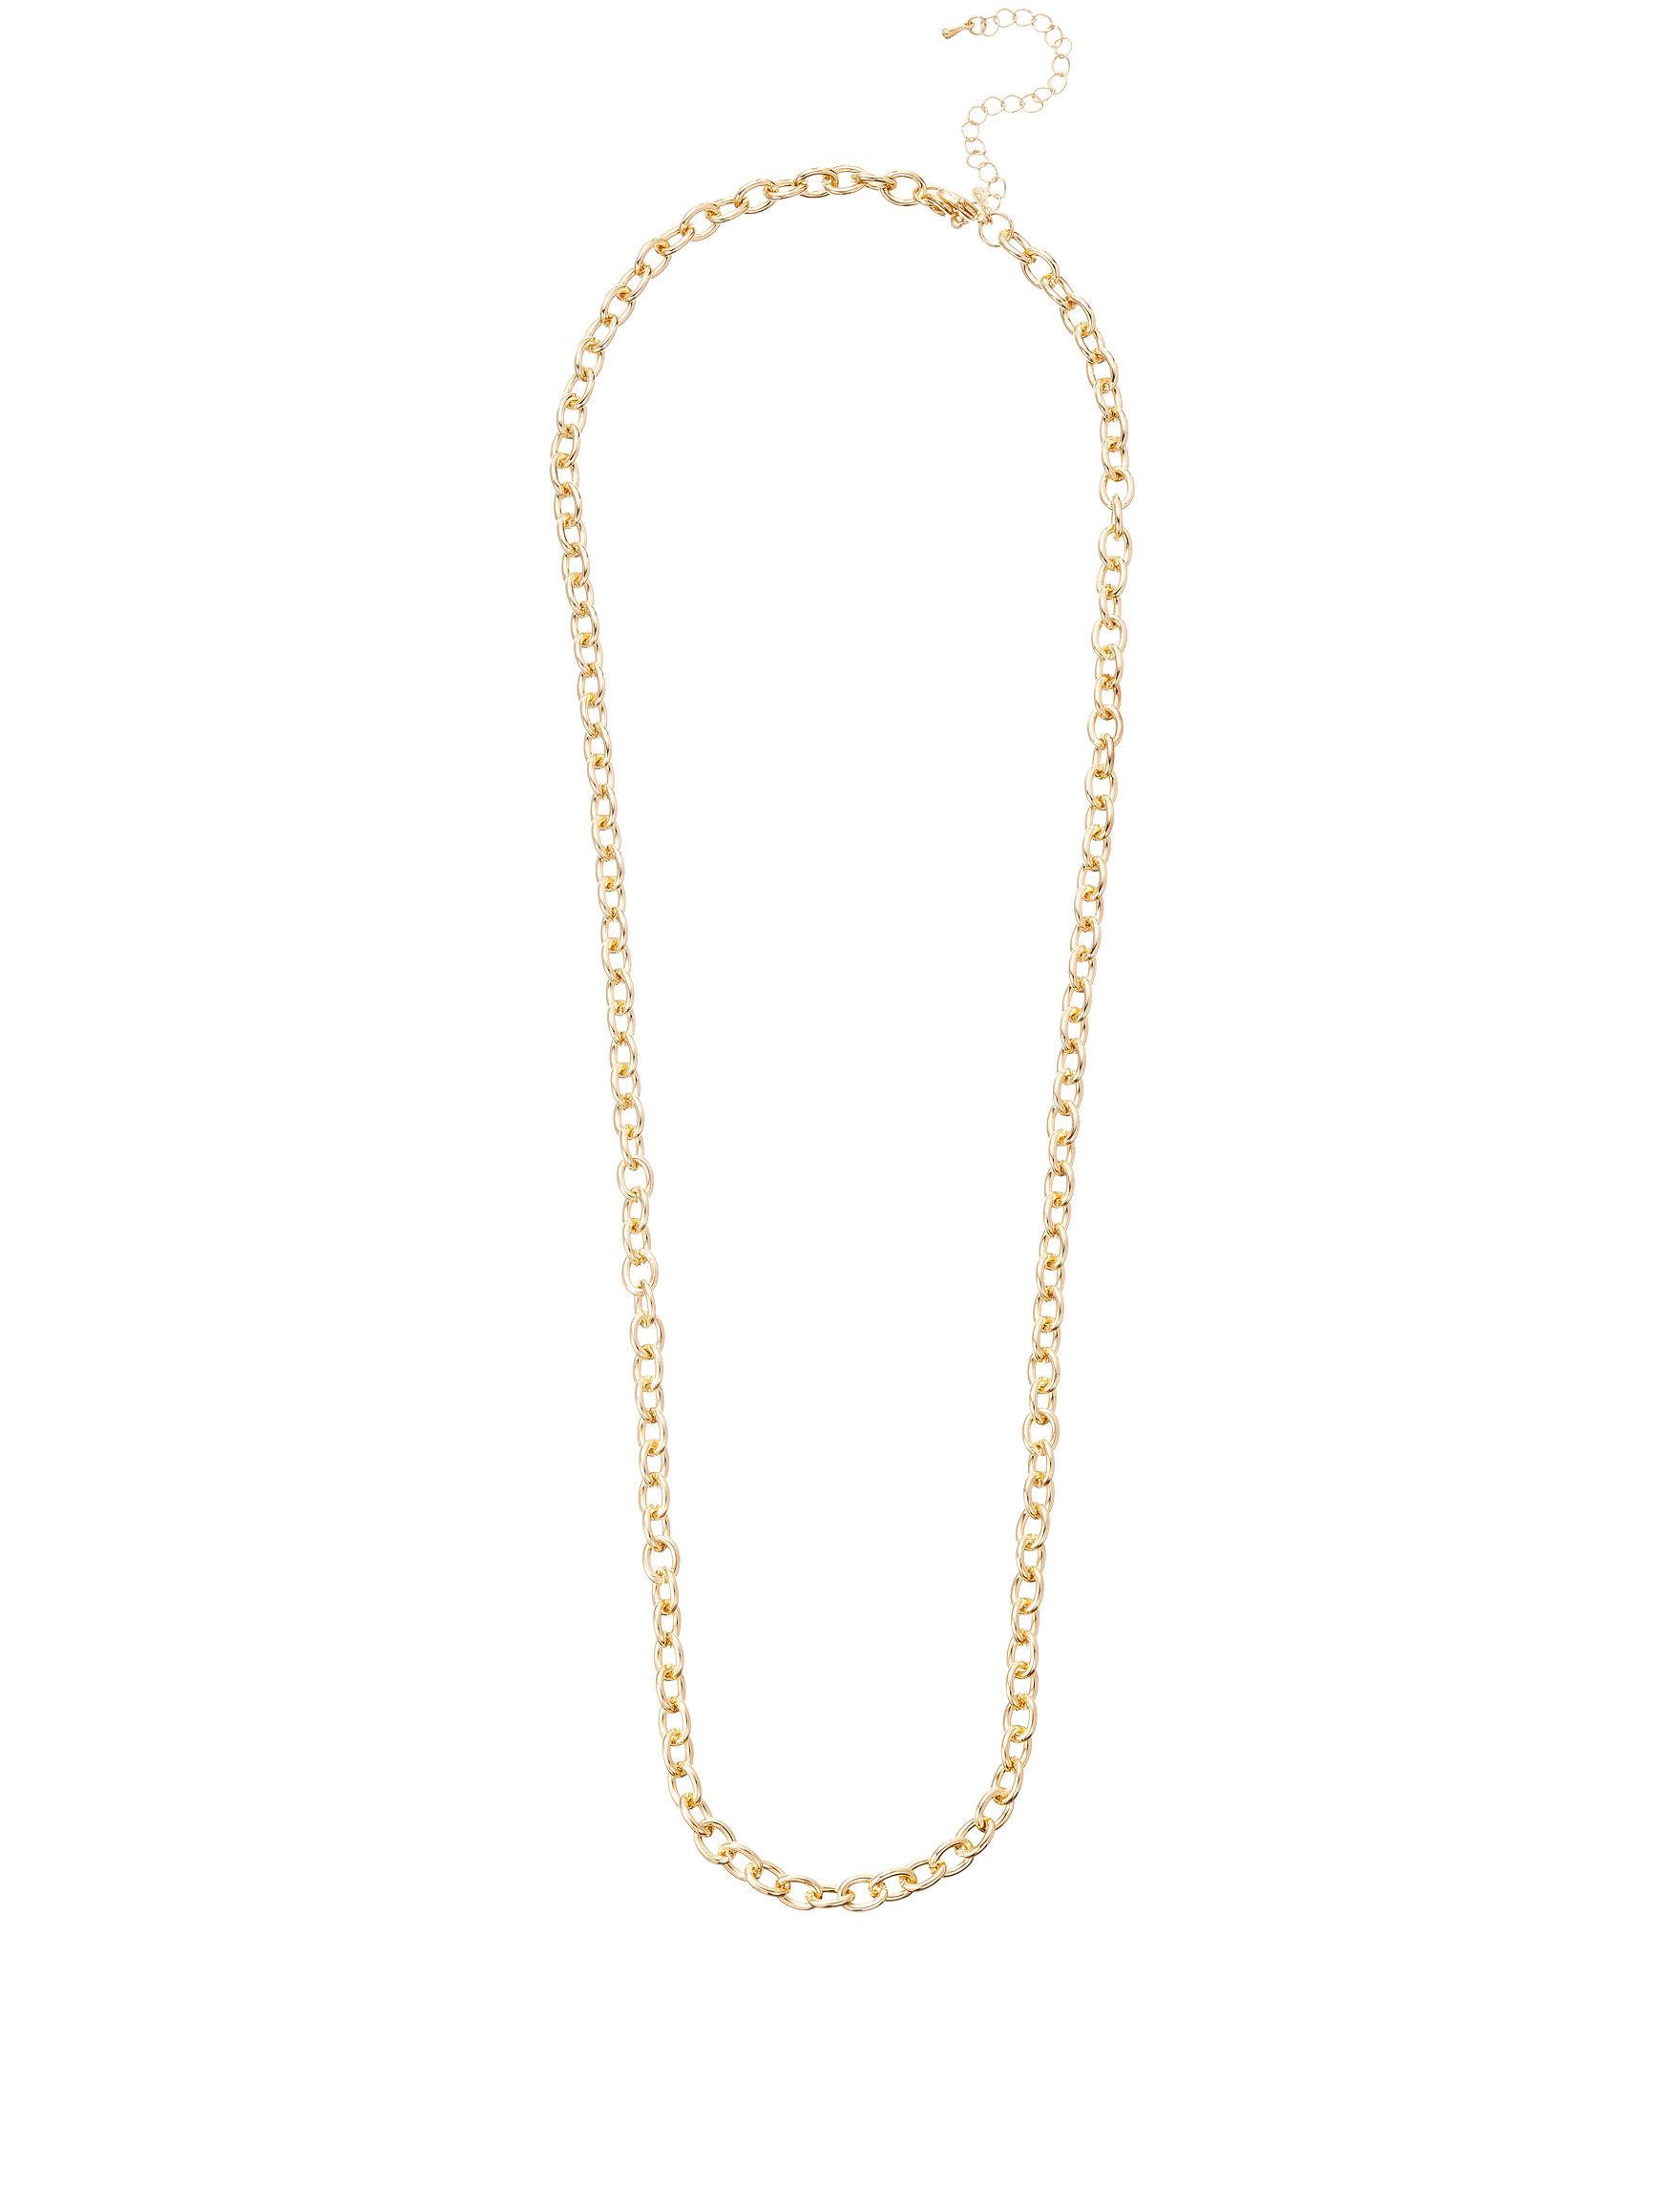 Wearable Art Gold Fashion Jewelry